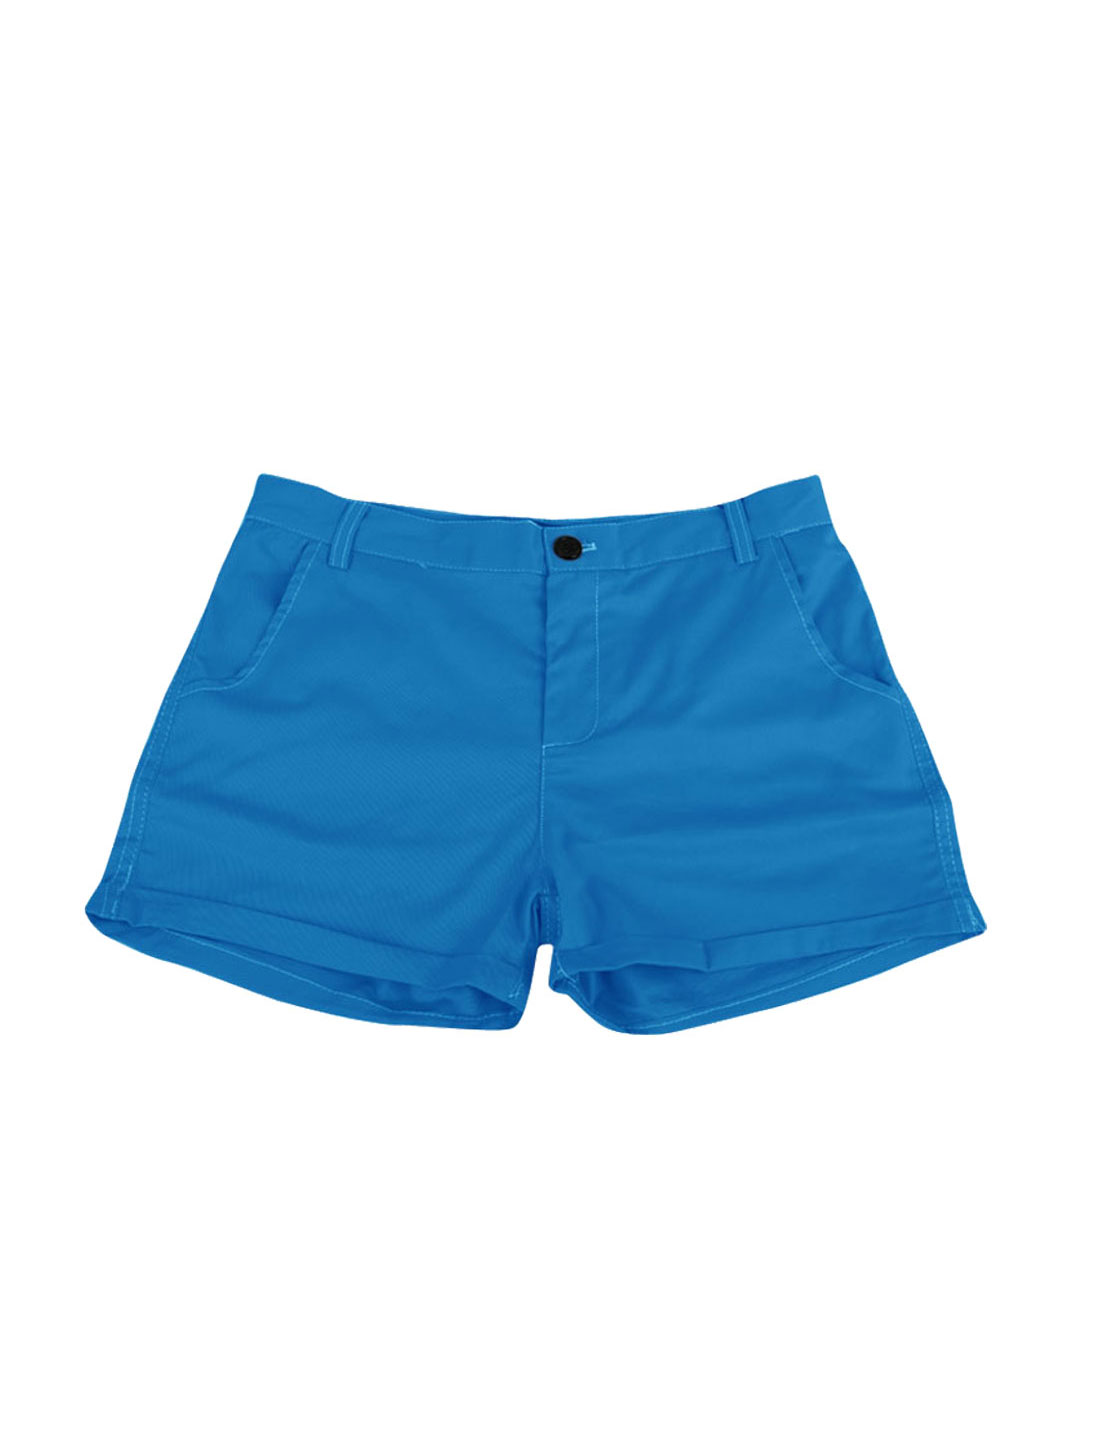 Blue S Hidden Zipper Belt Loop Front Pockets Style Ladies Pure Shorts